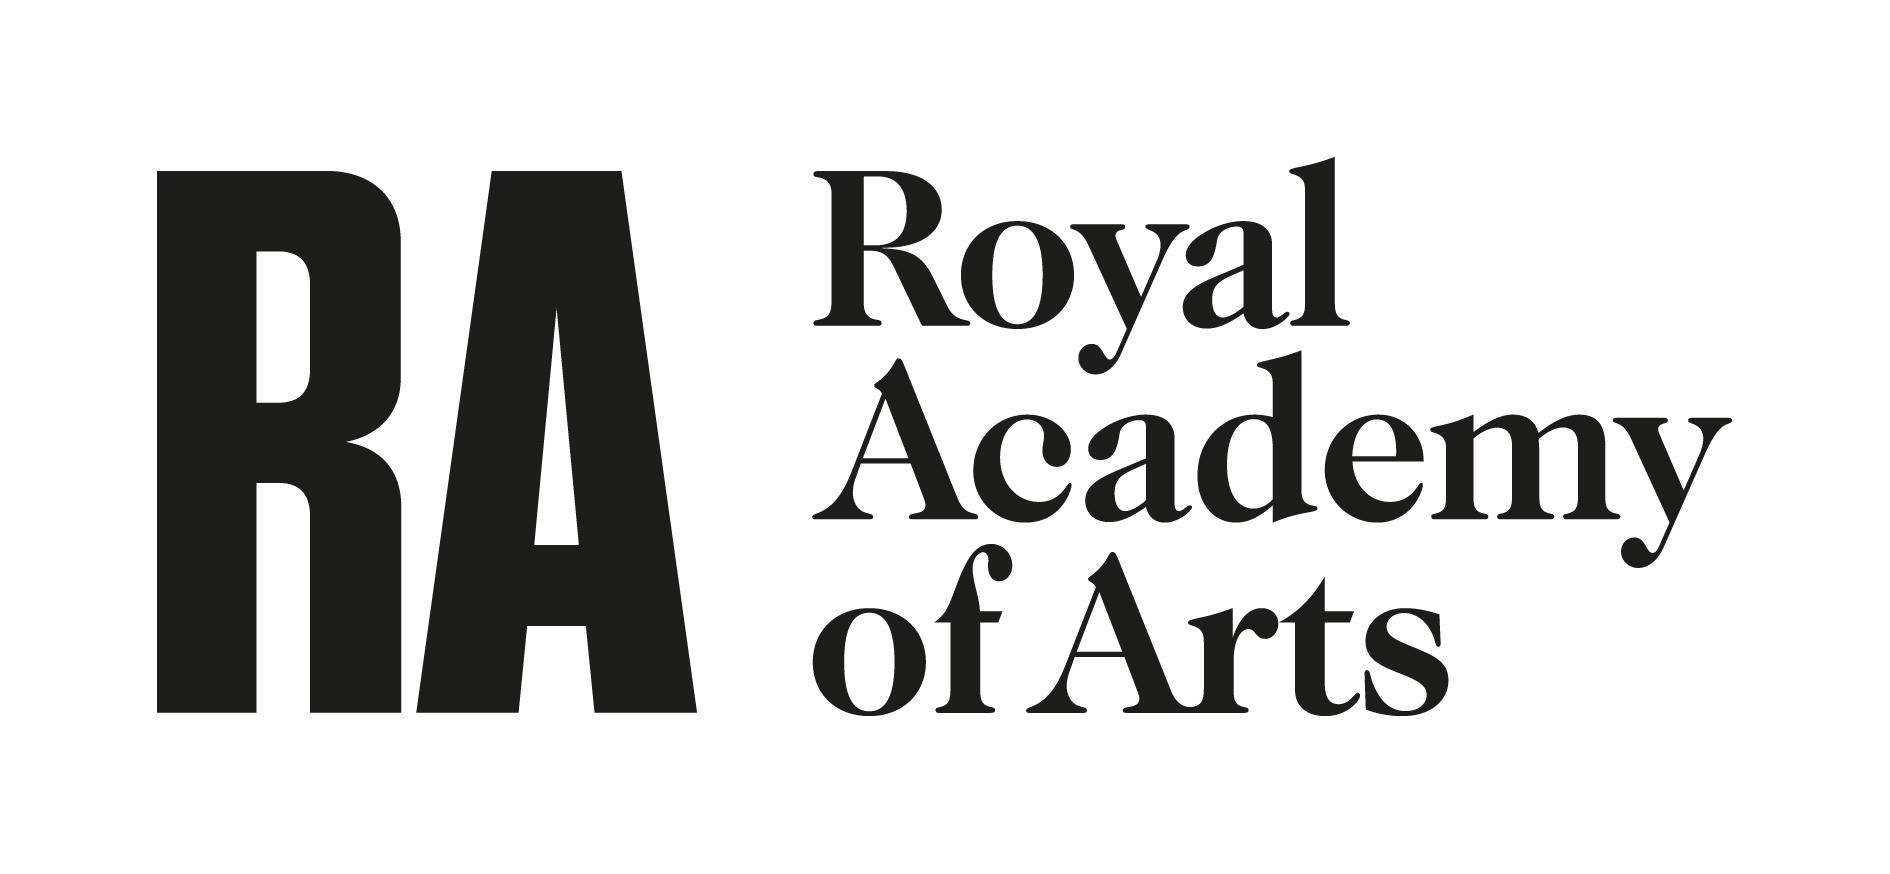 rMz2ONYEQ7C3JMe2h1ol_royal_academy_of_ar